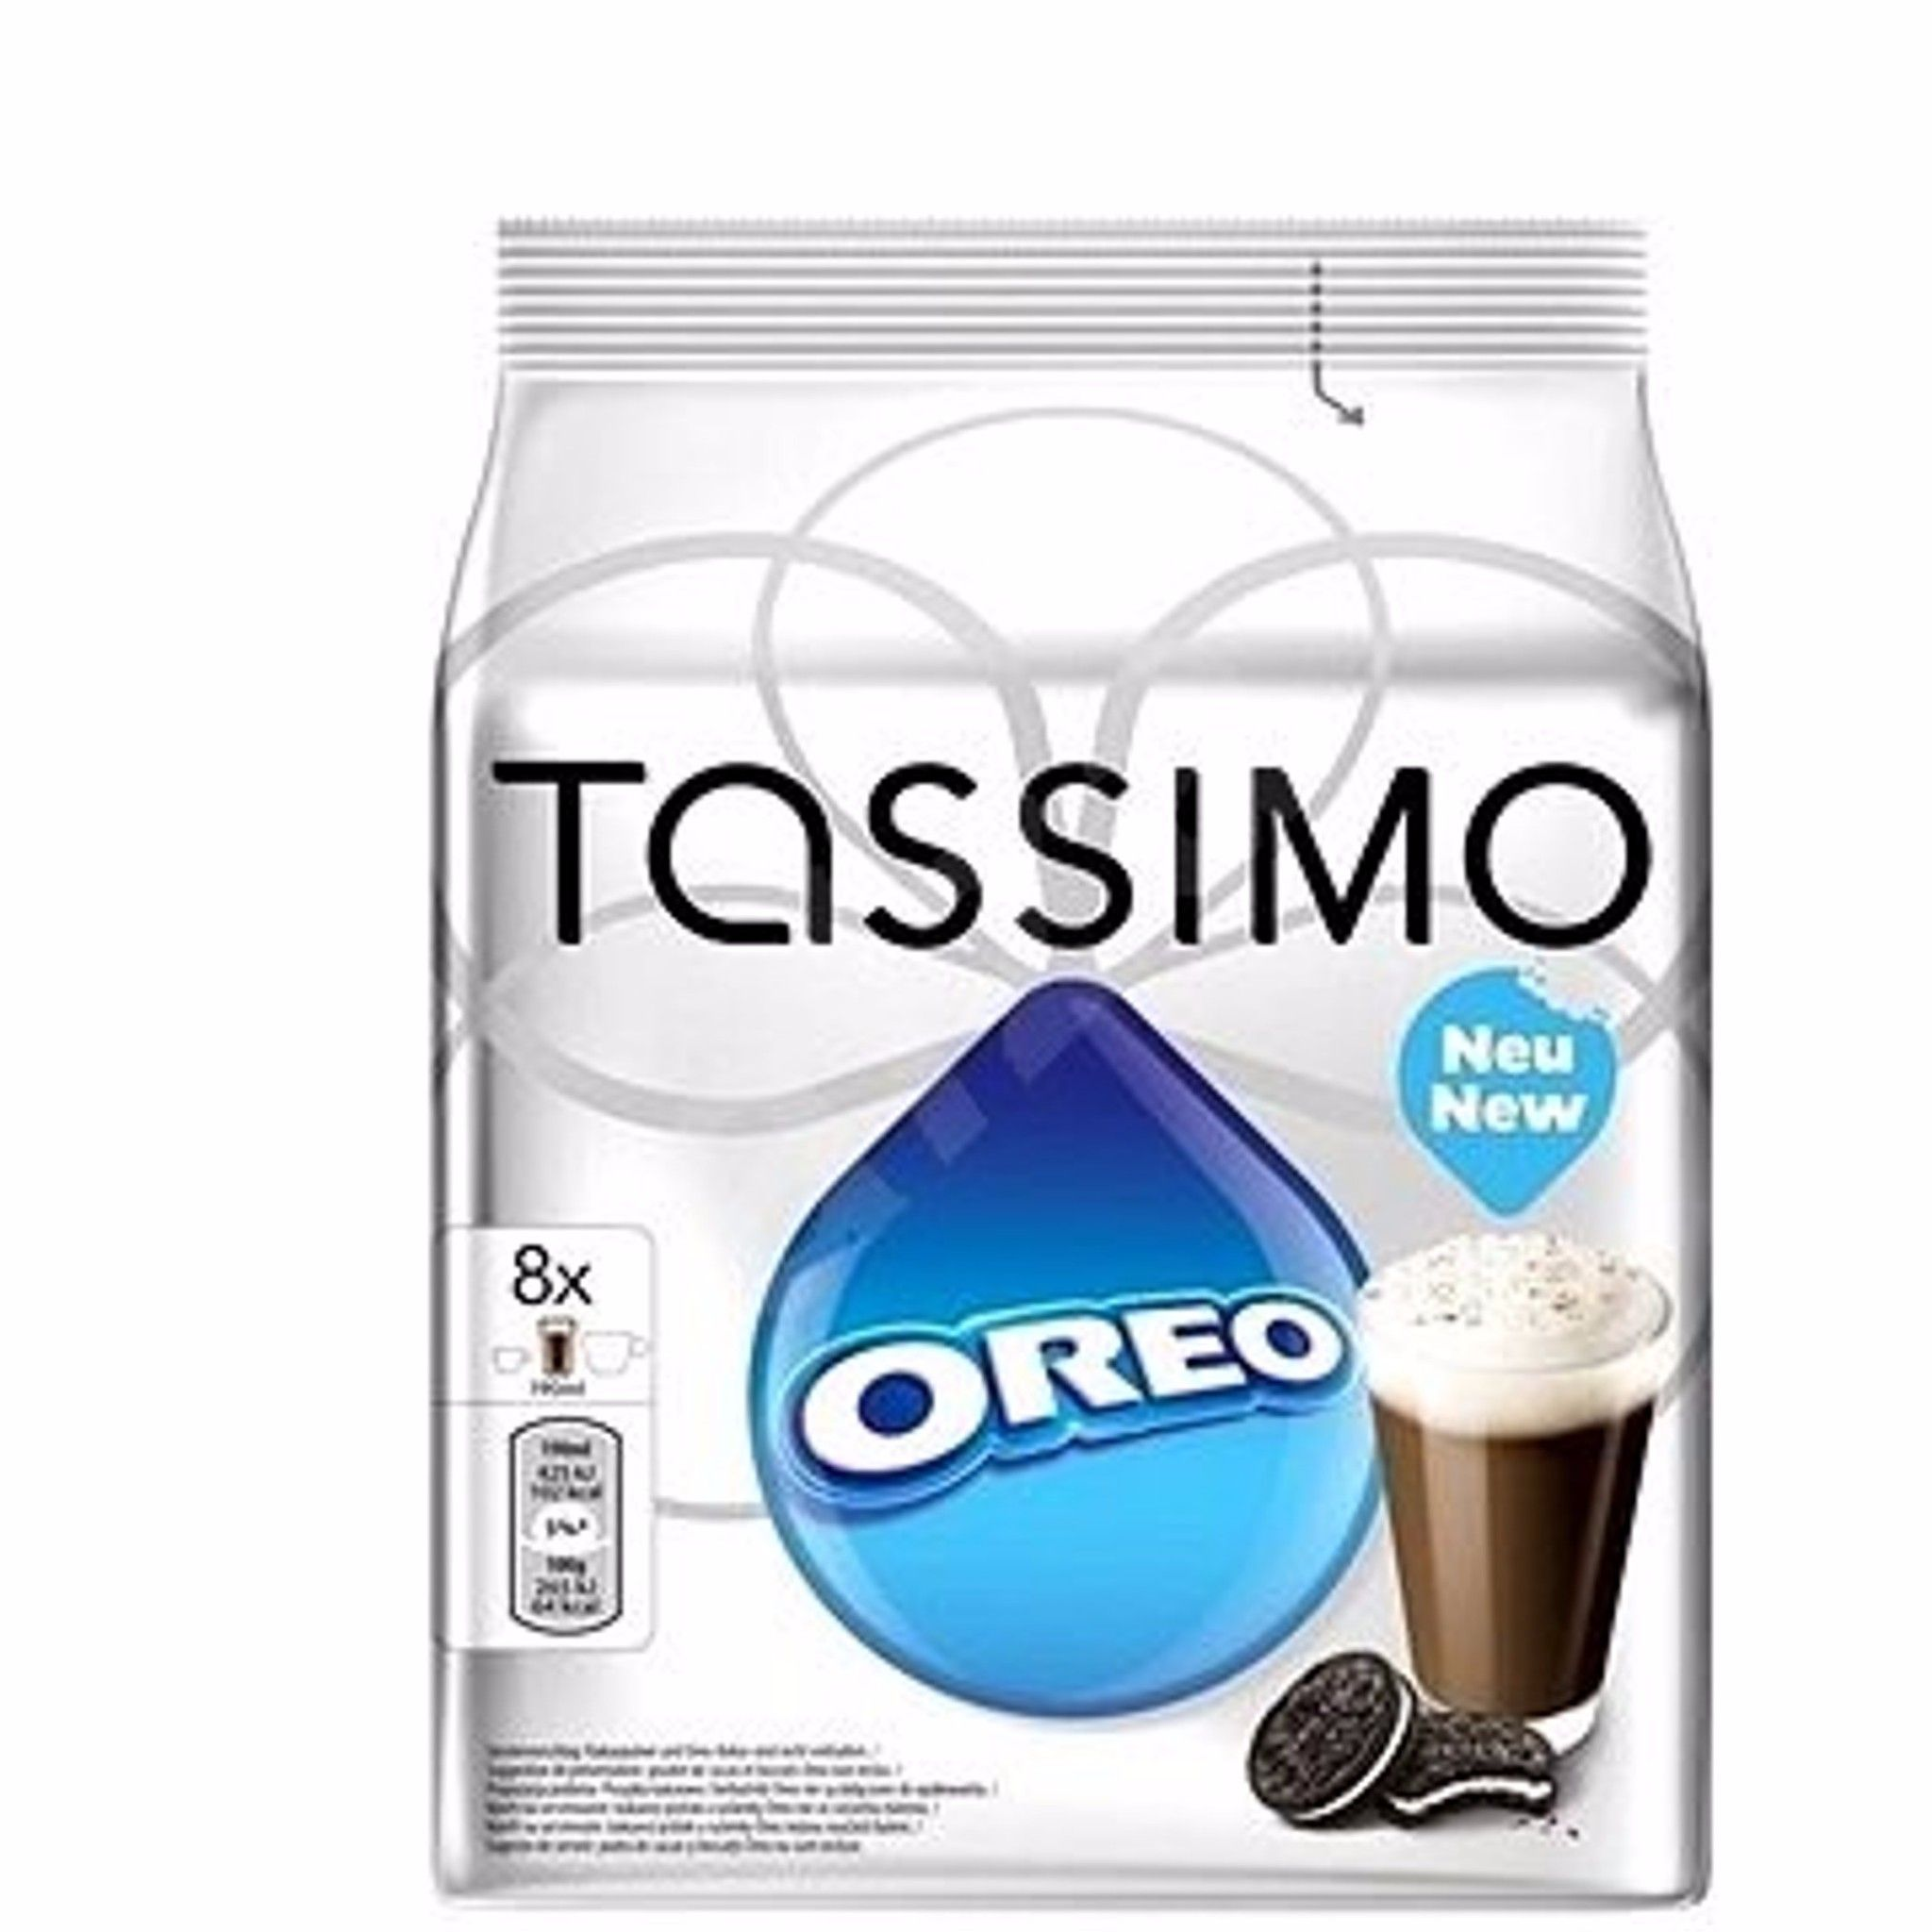 Tassimo Oreo Hot Chocolate Coffee Pods Food Hot